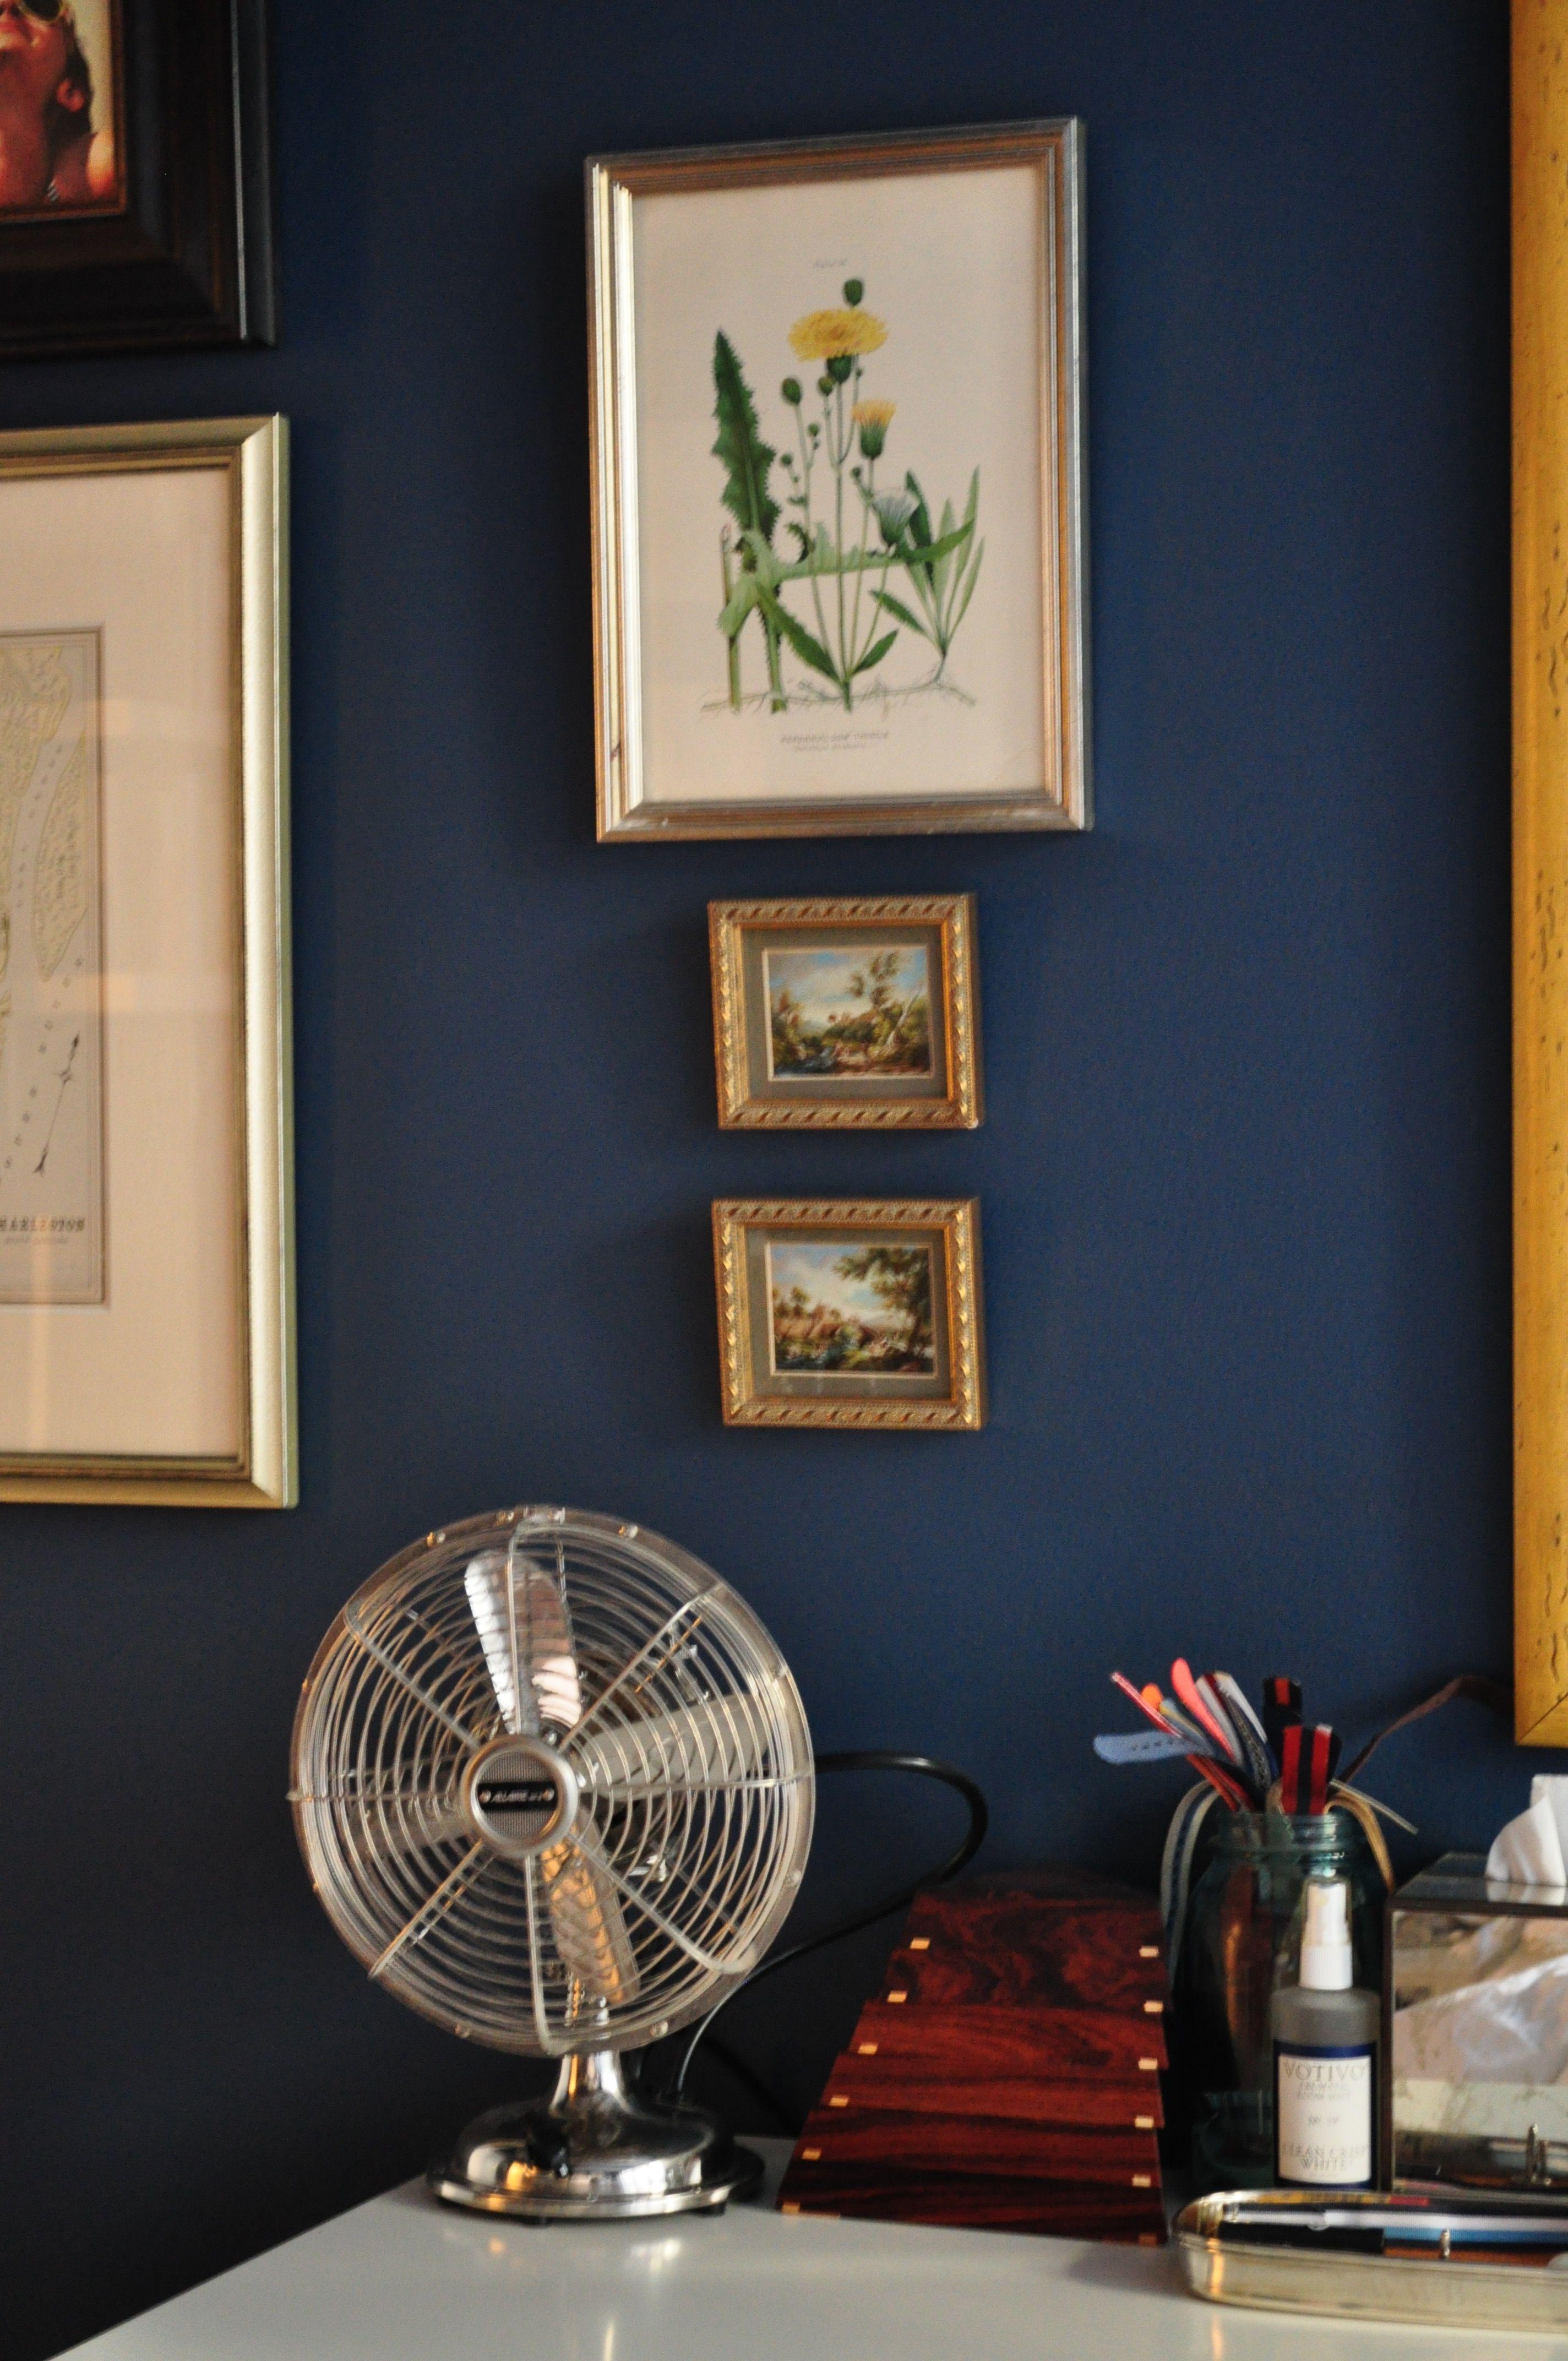 bm gentleman 39 s grey walls art pinterest gray. Black Bedroom Furniture Sets. Home Design Ideas